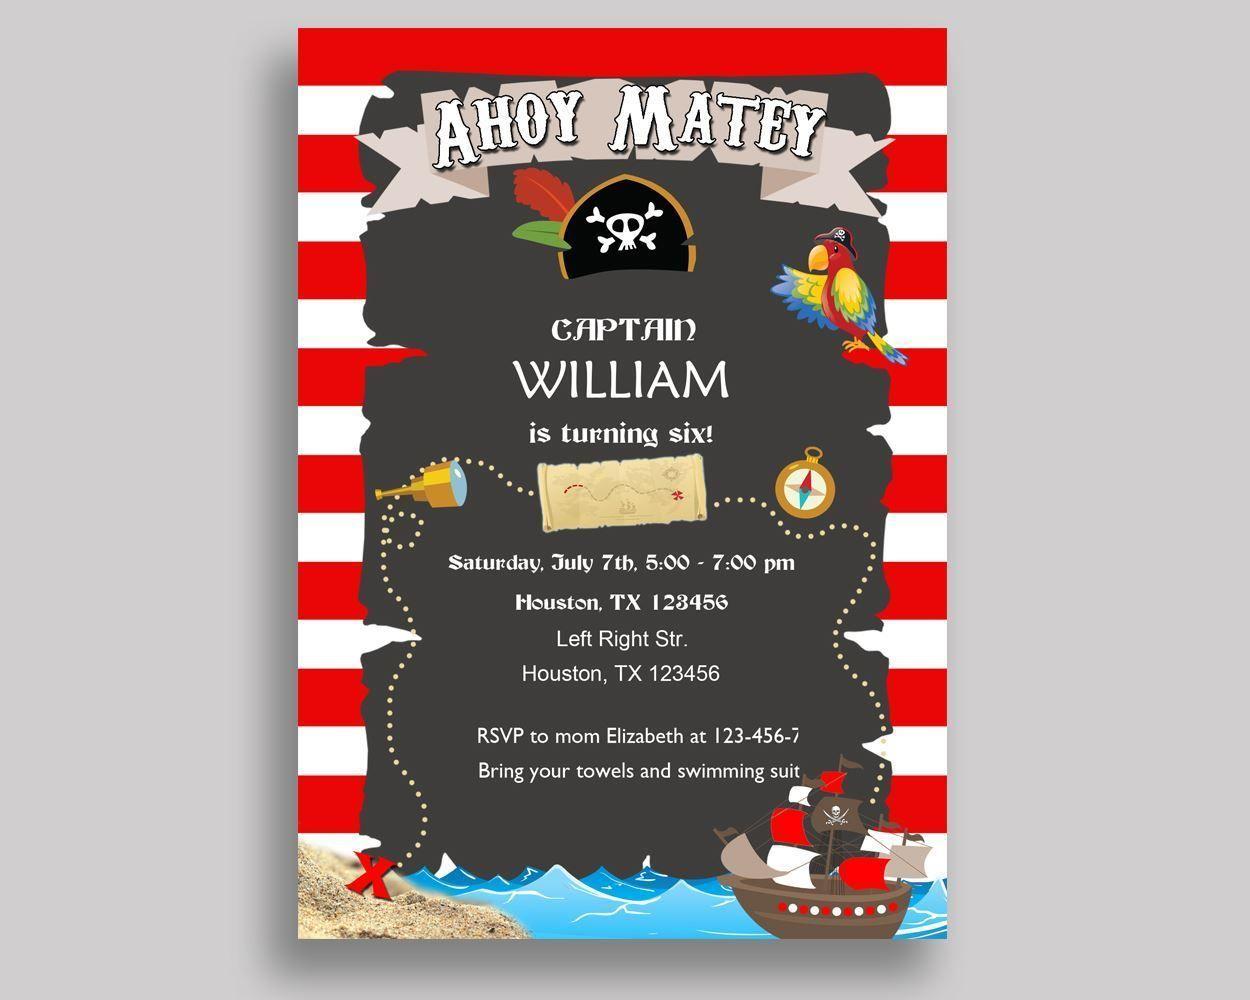 Pirate Birthday Invitation Pirate Birthday Party Invitation Pirate ...